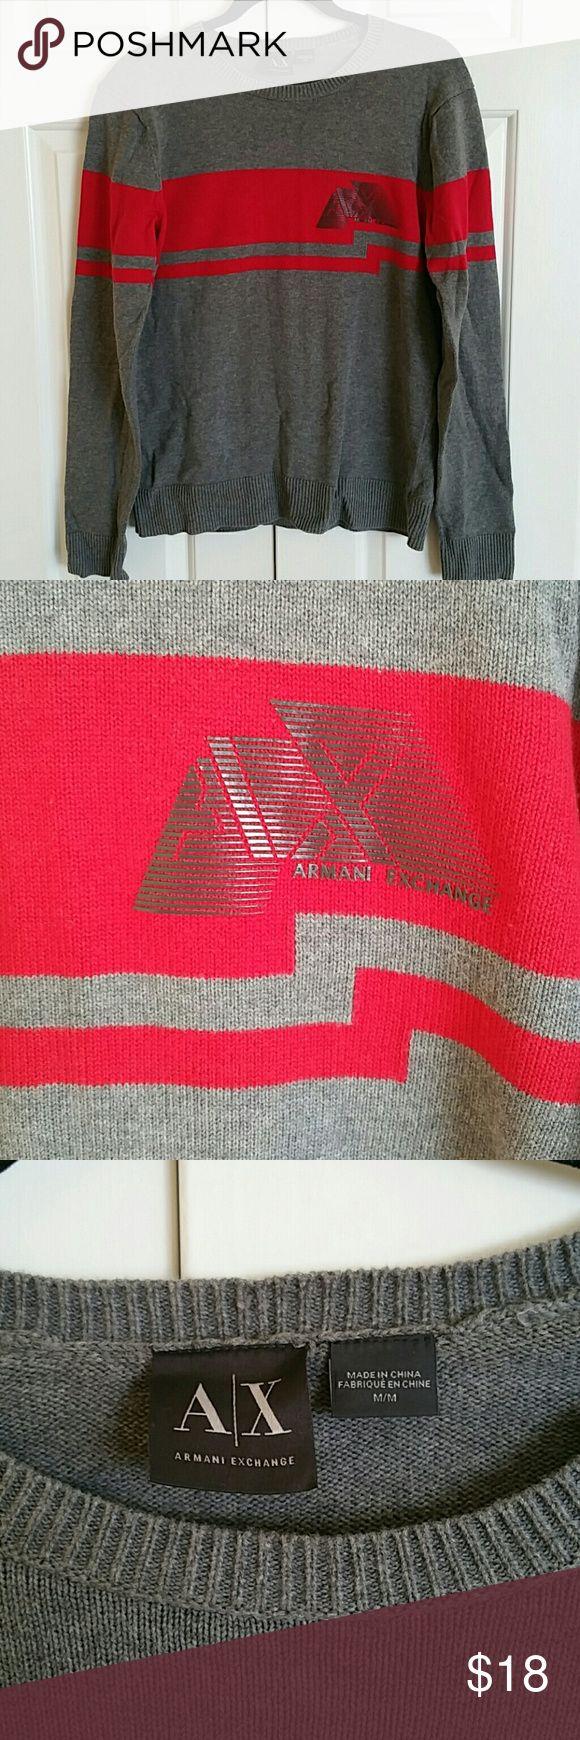 Selling this Armani exchange knit on Poshmark! My username is: holic012. #shopmycloset #poshmark #fashion #shopping #style #forsale #Armani Exchange #Sweaters